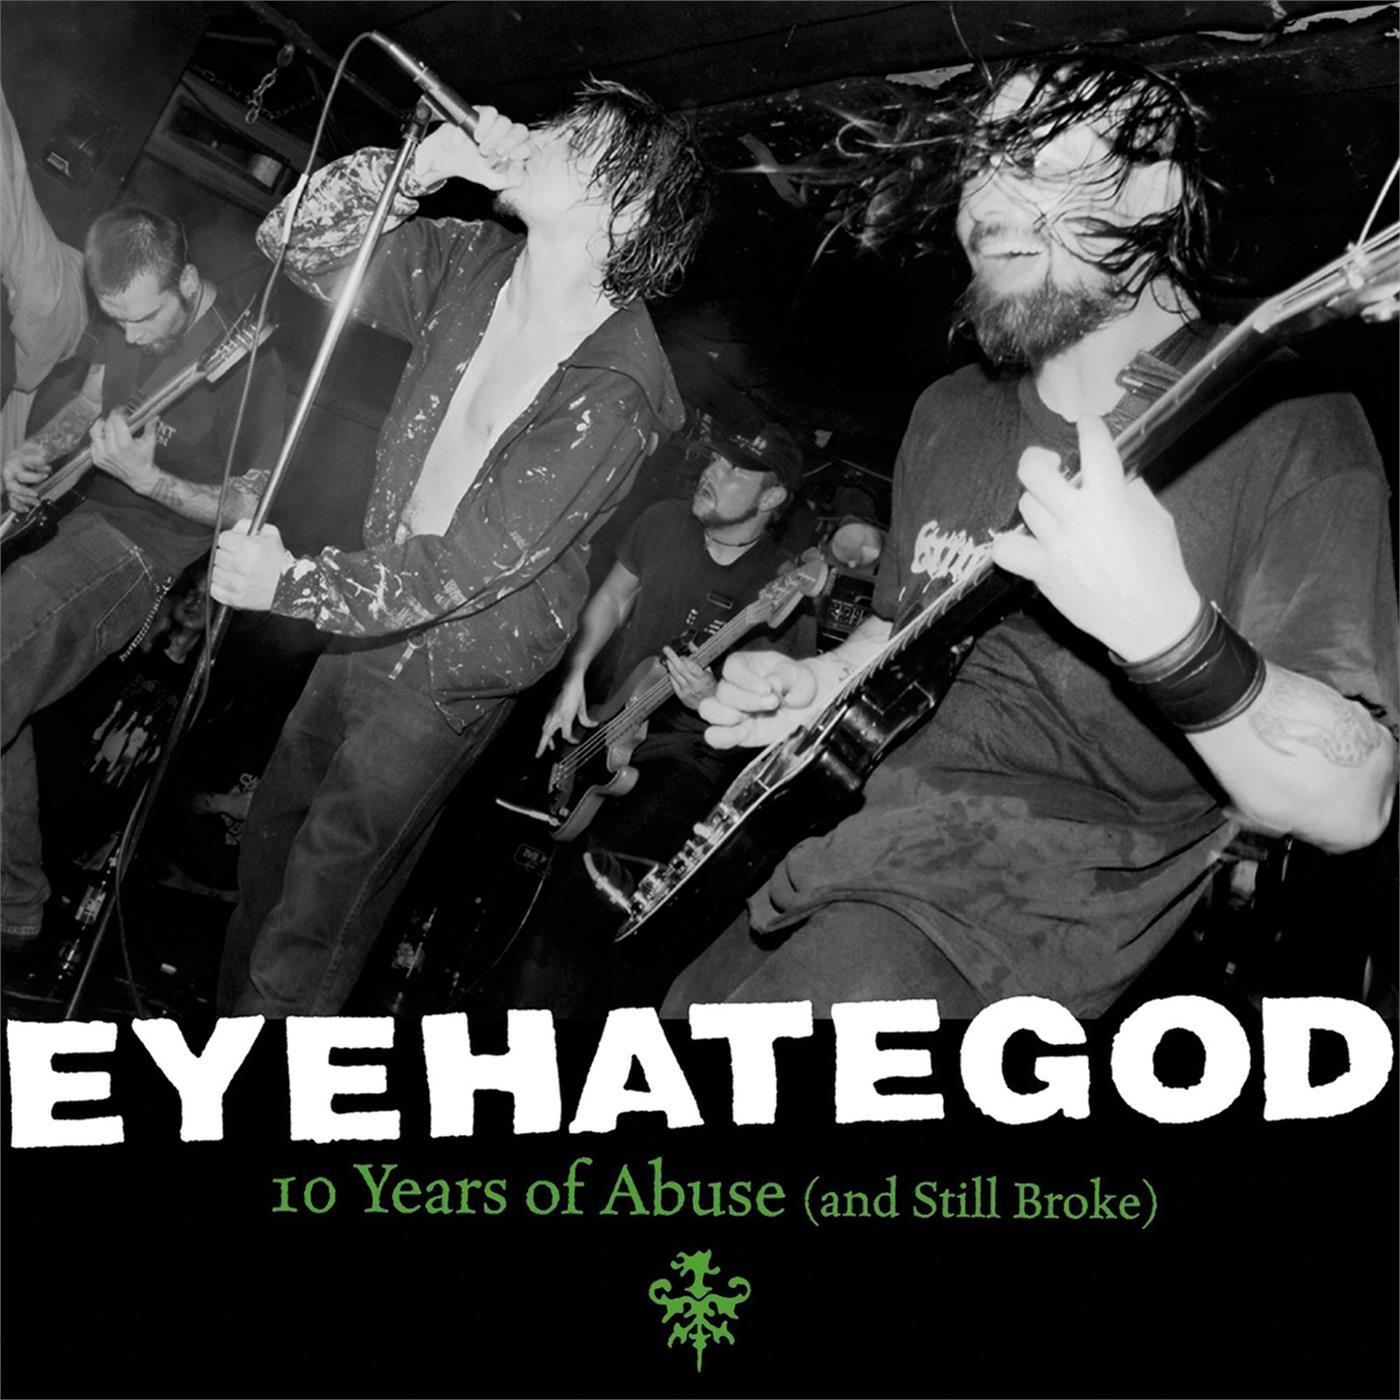 EyeHateGod - Ten Years Of Abuse (And Still Broke) [2xLP]